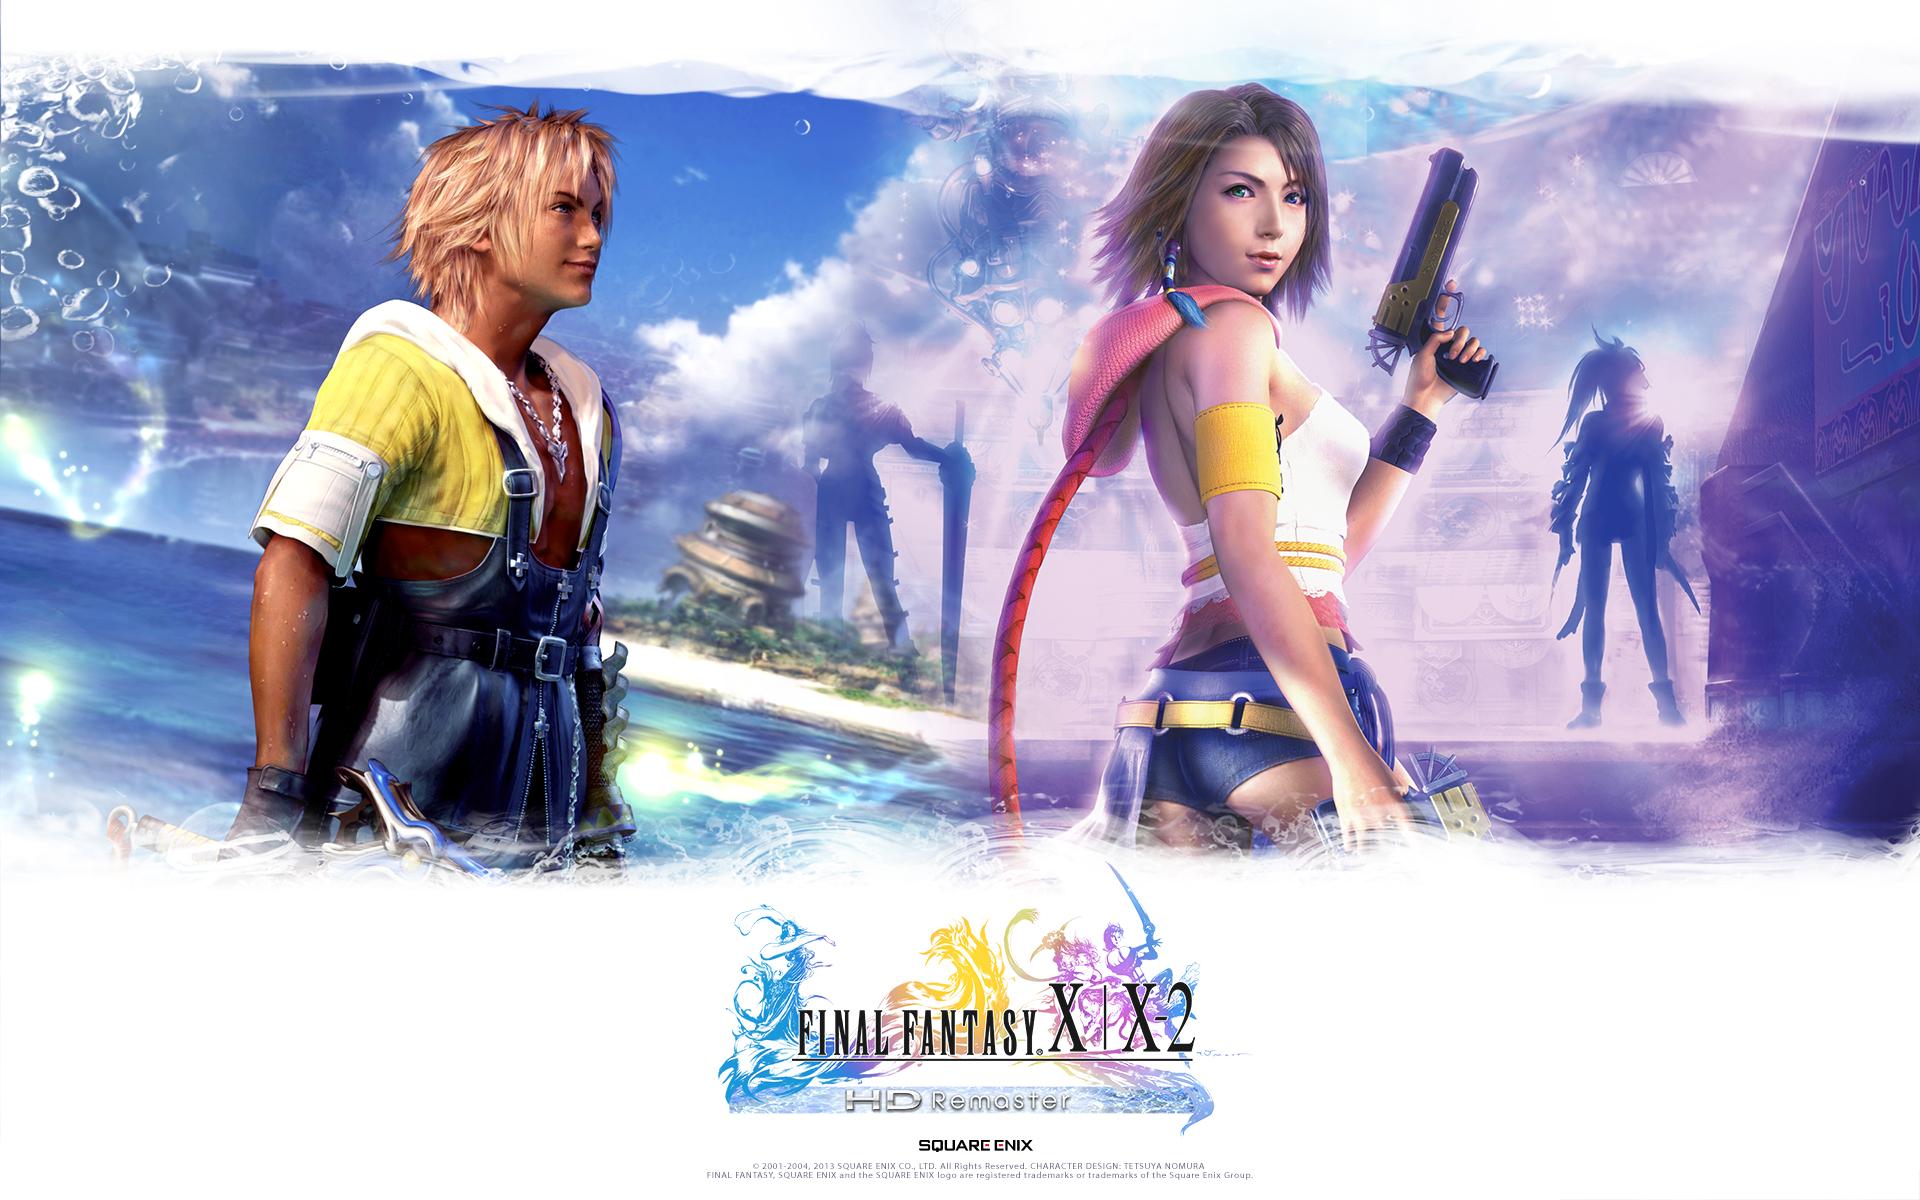 HD Remaster pentru Final Fantasy X/X-2?